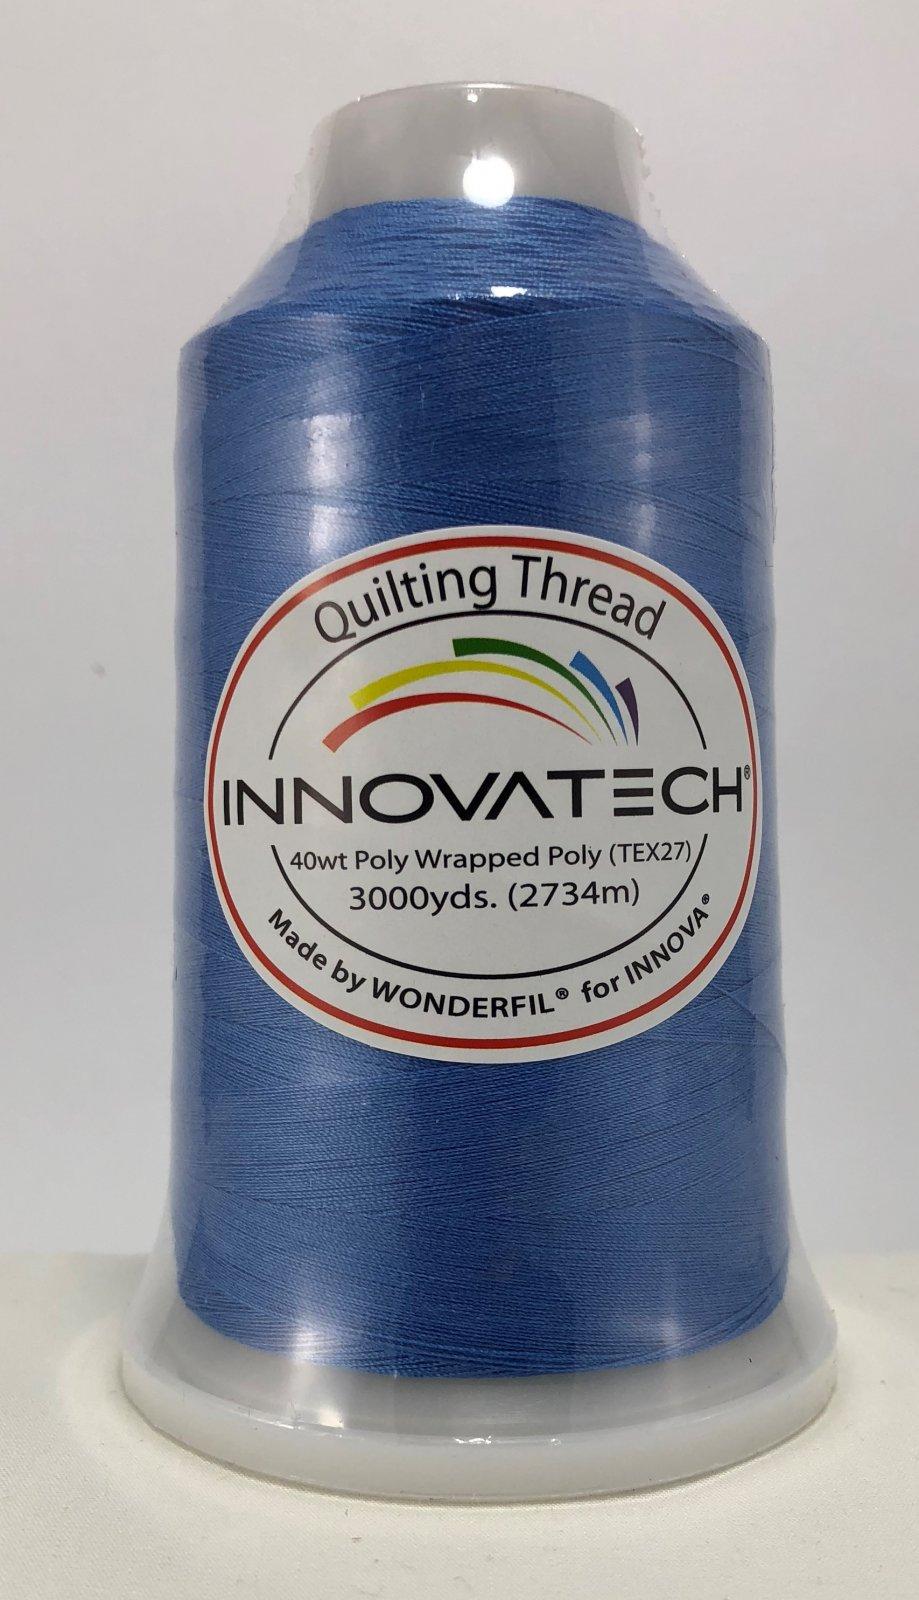 Innovatech THD3045 PW46 LARGO